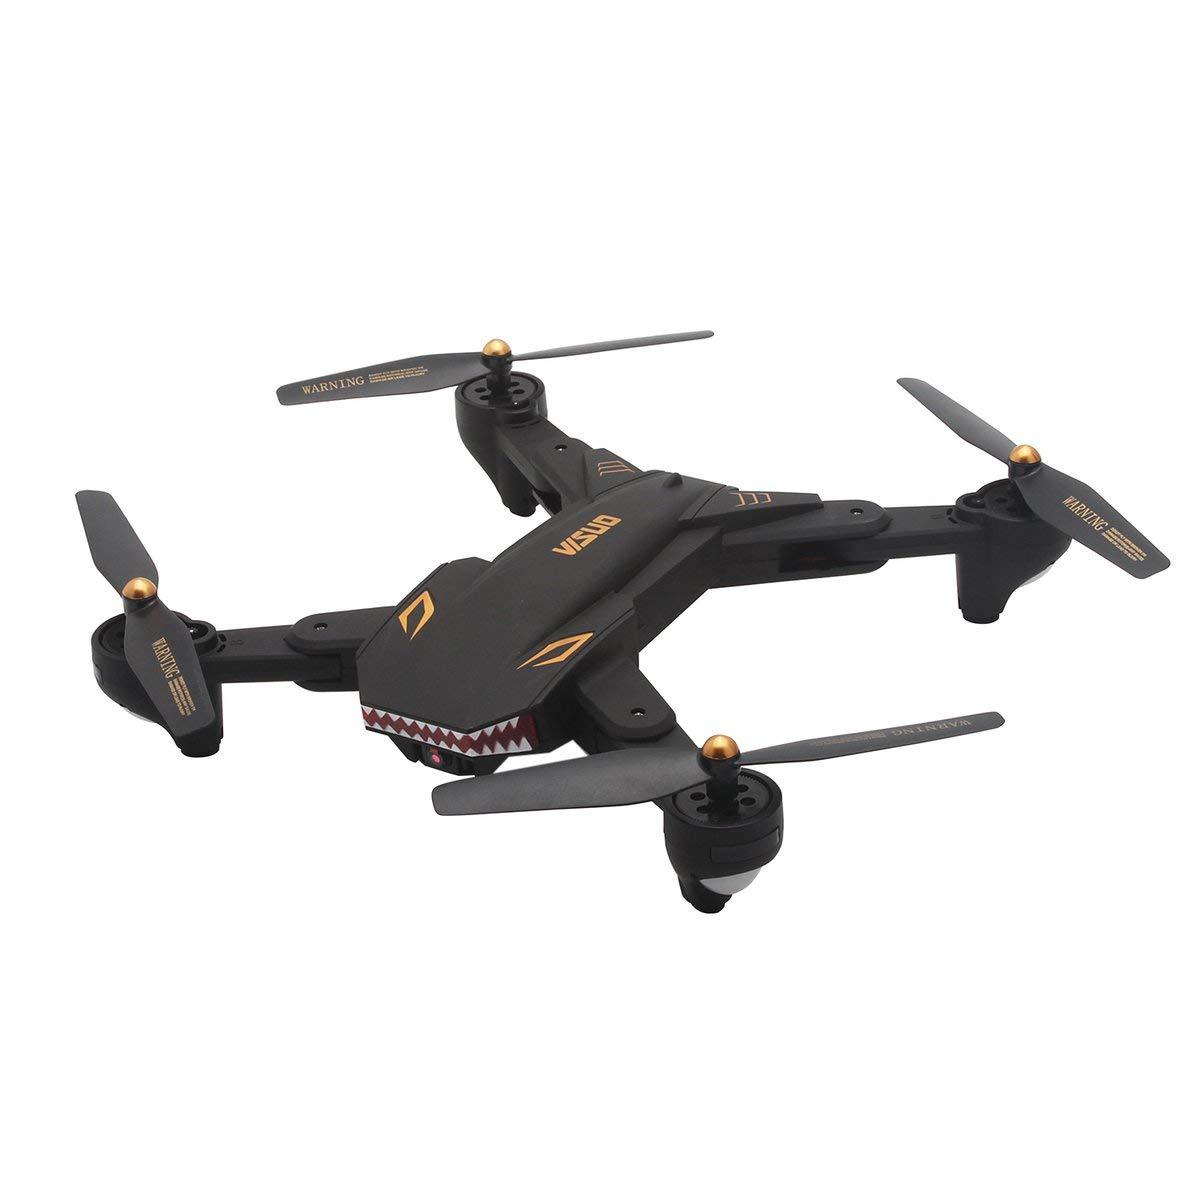 Gugutogo Drohne Mit Kamera XS809S RC Drohne mit 0.3MP WiFi Kamera Faltbare Höhe Halten G-Sensor Drohne (3 Batterien)